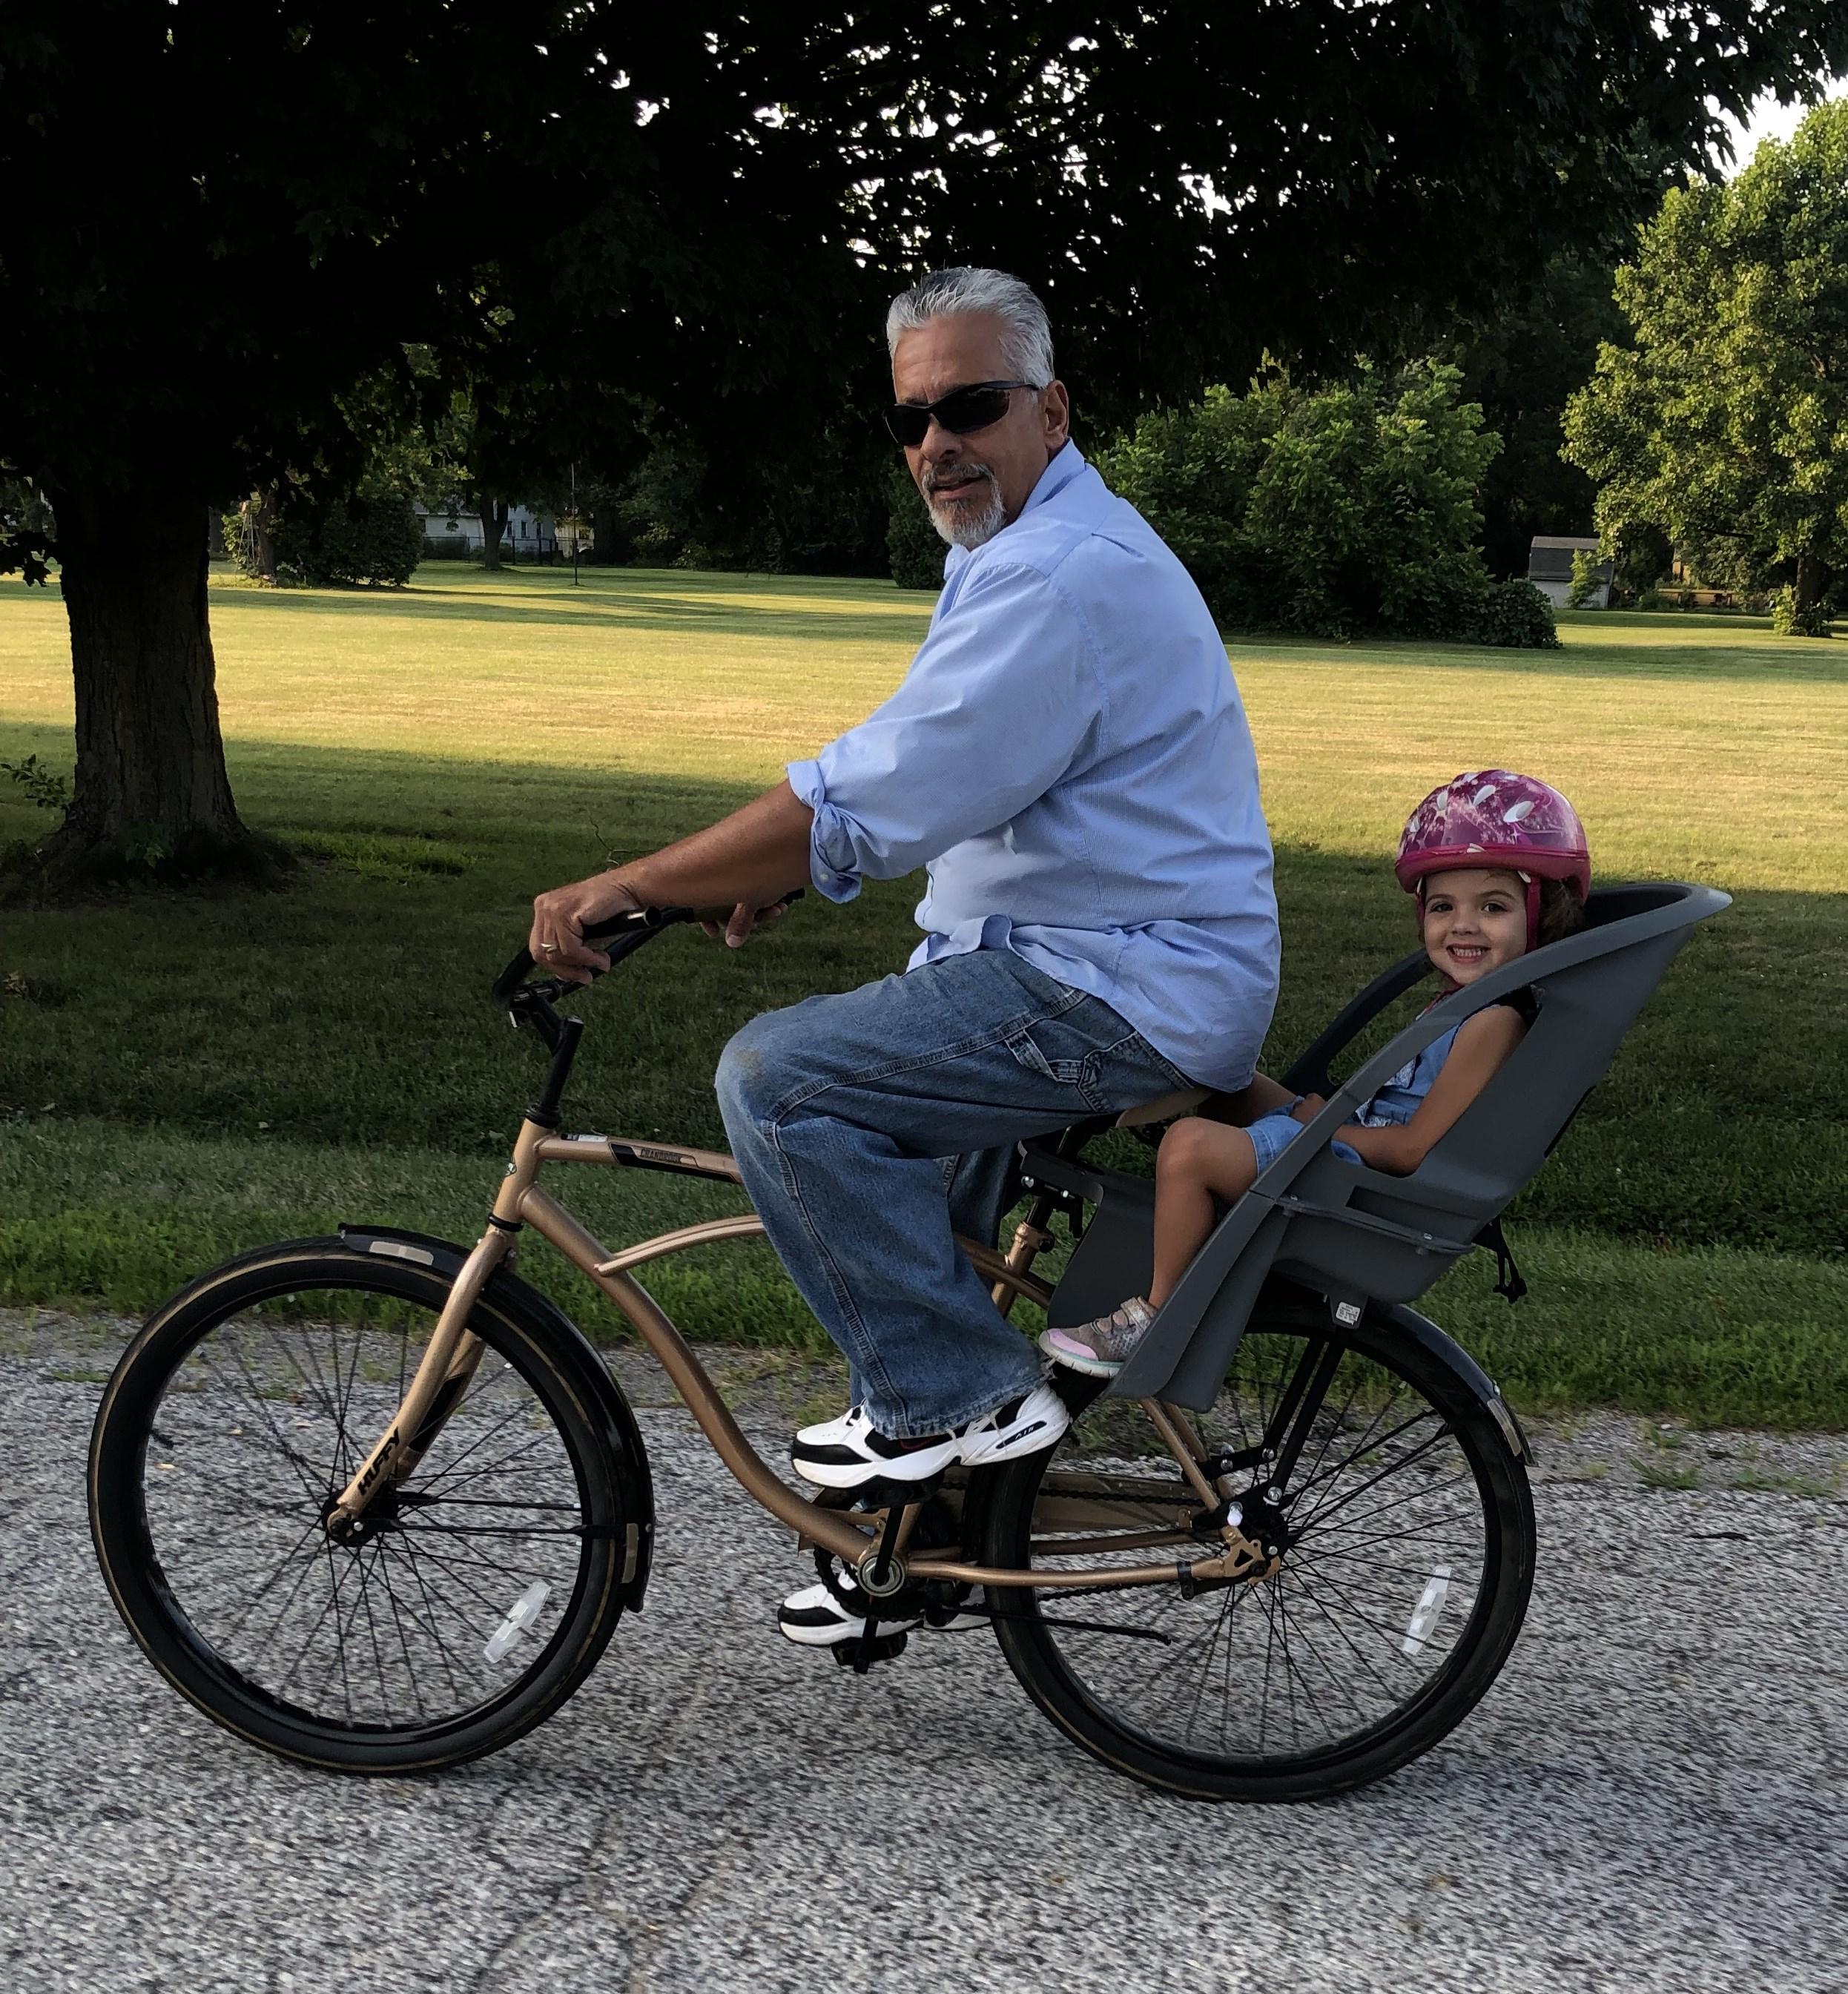 play riding bike 2